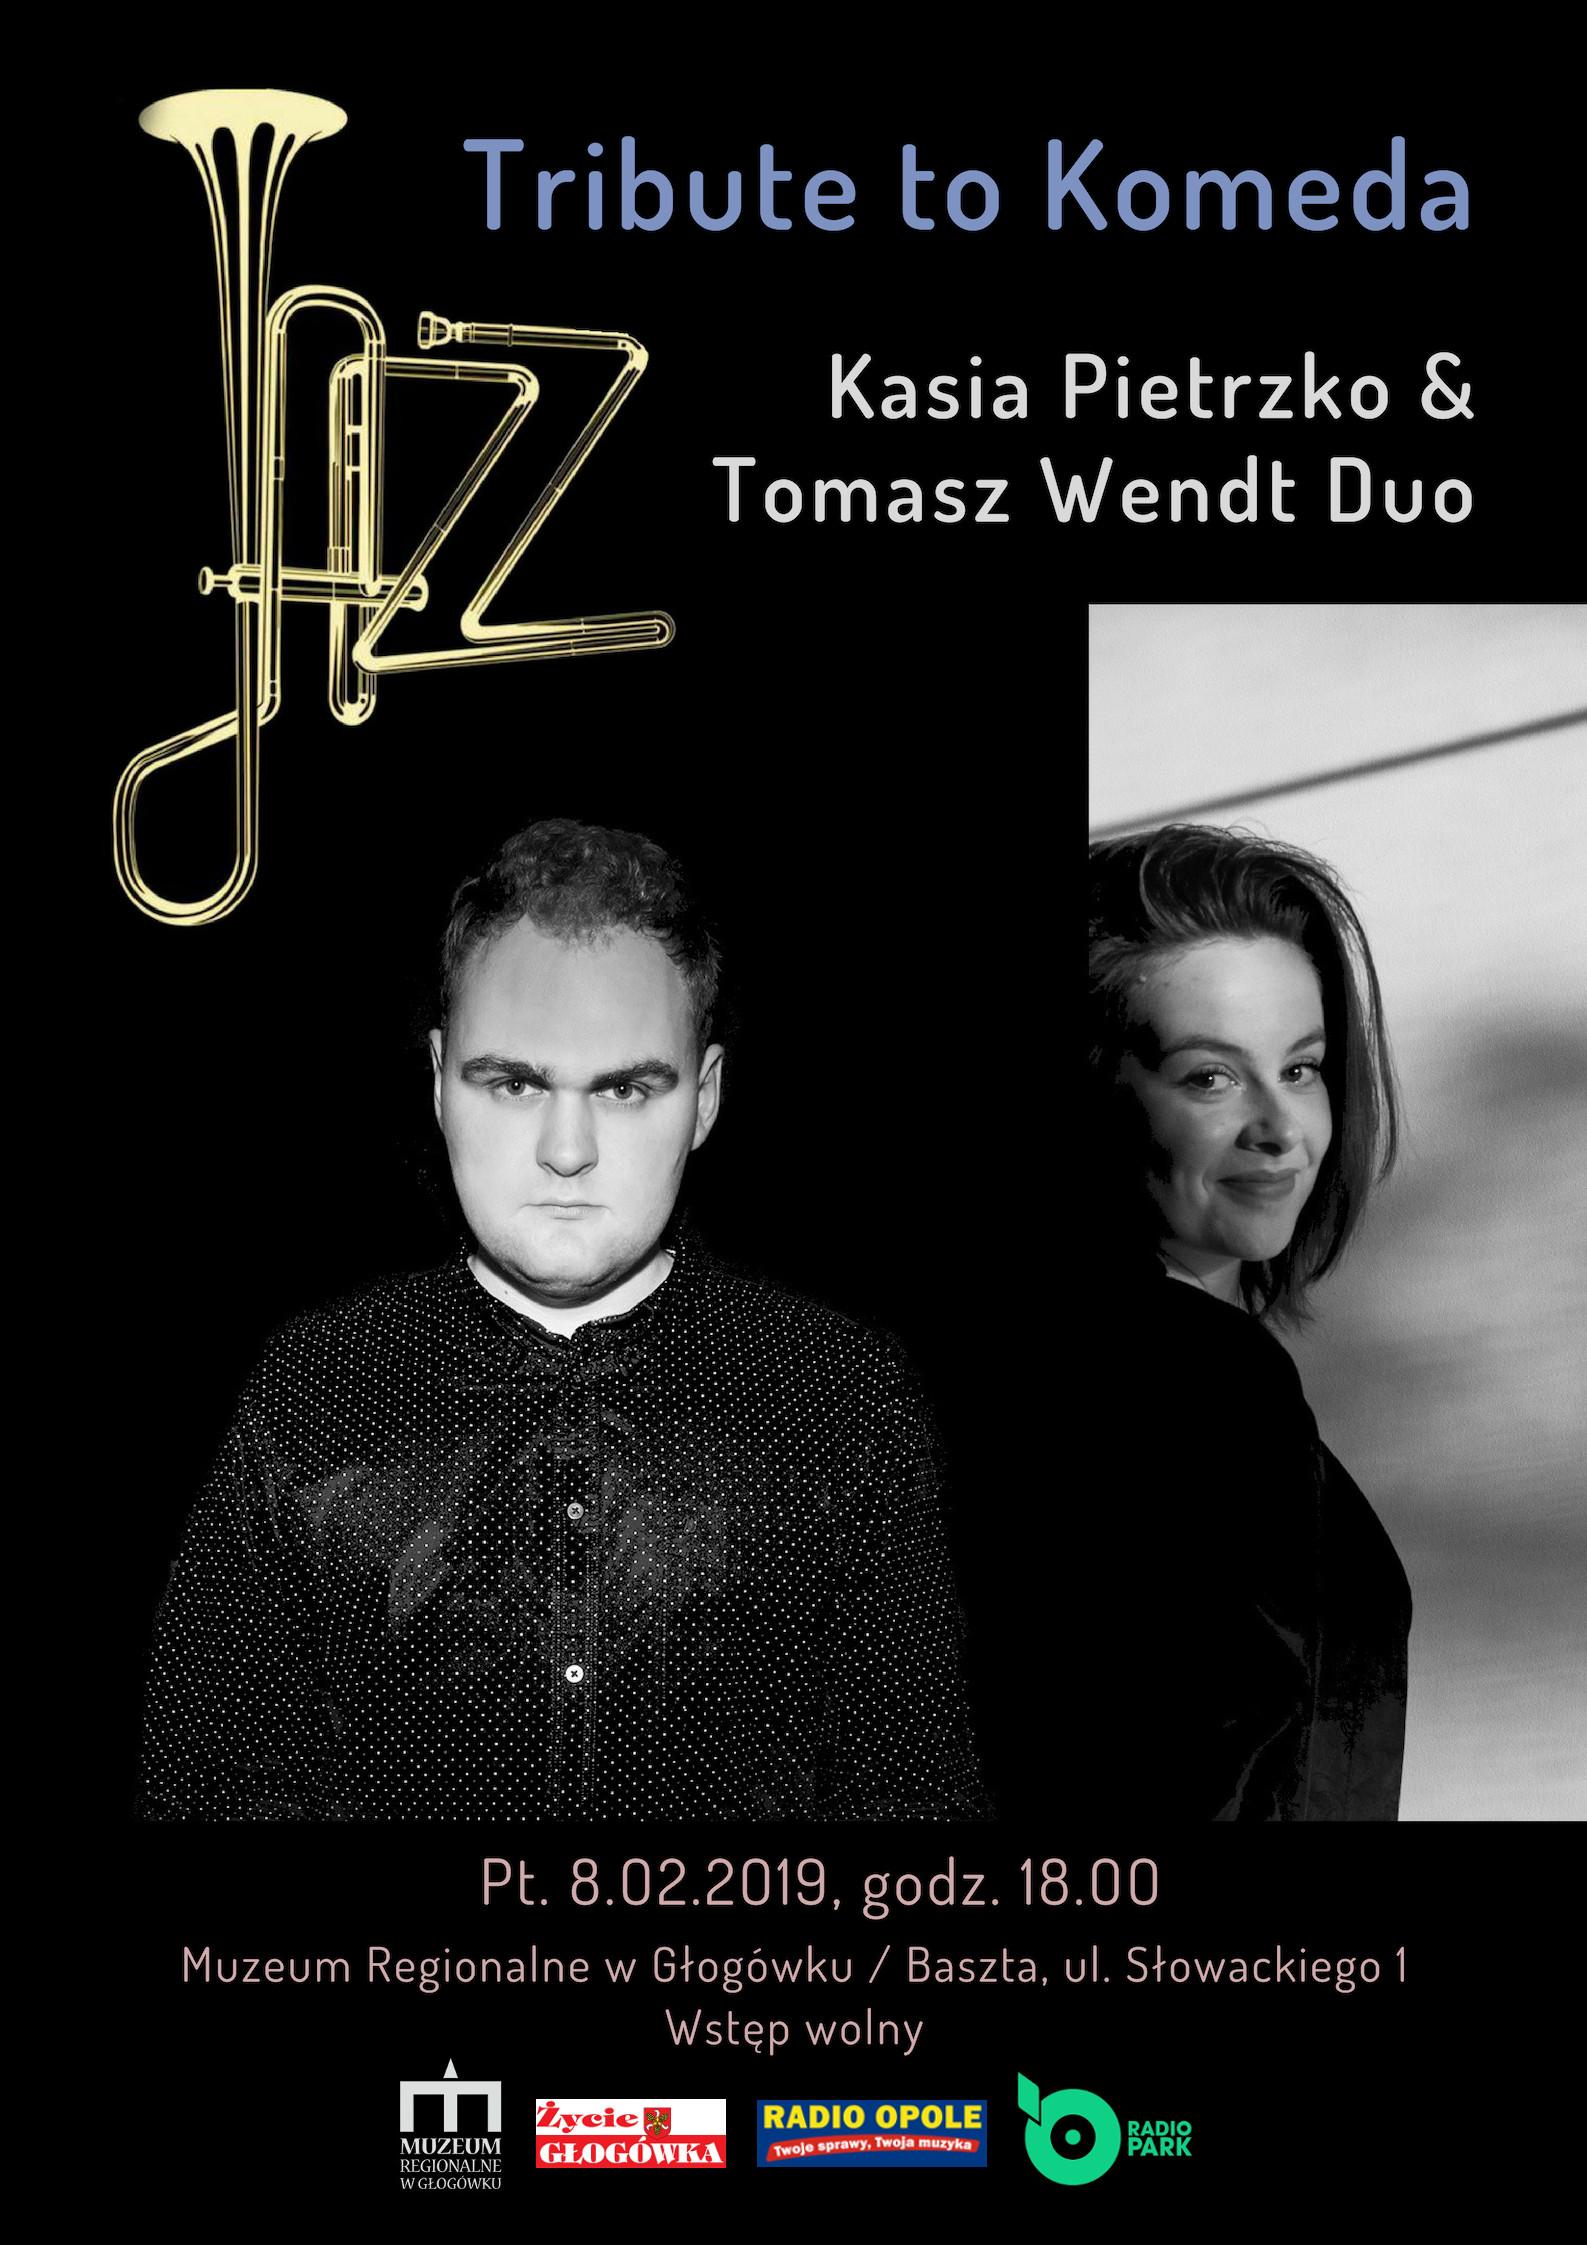 Kasia Pietrzko & Tomasz Wendt Duo, Tribute to  Komeda